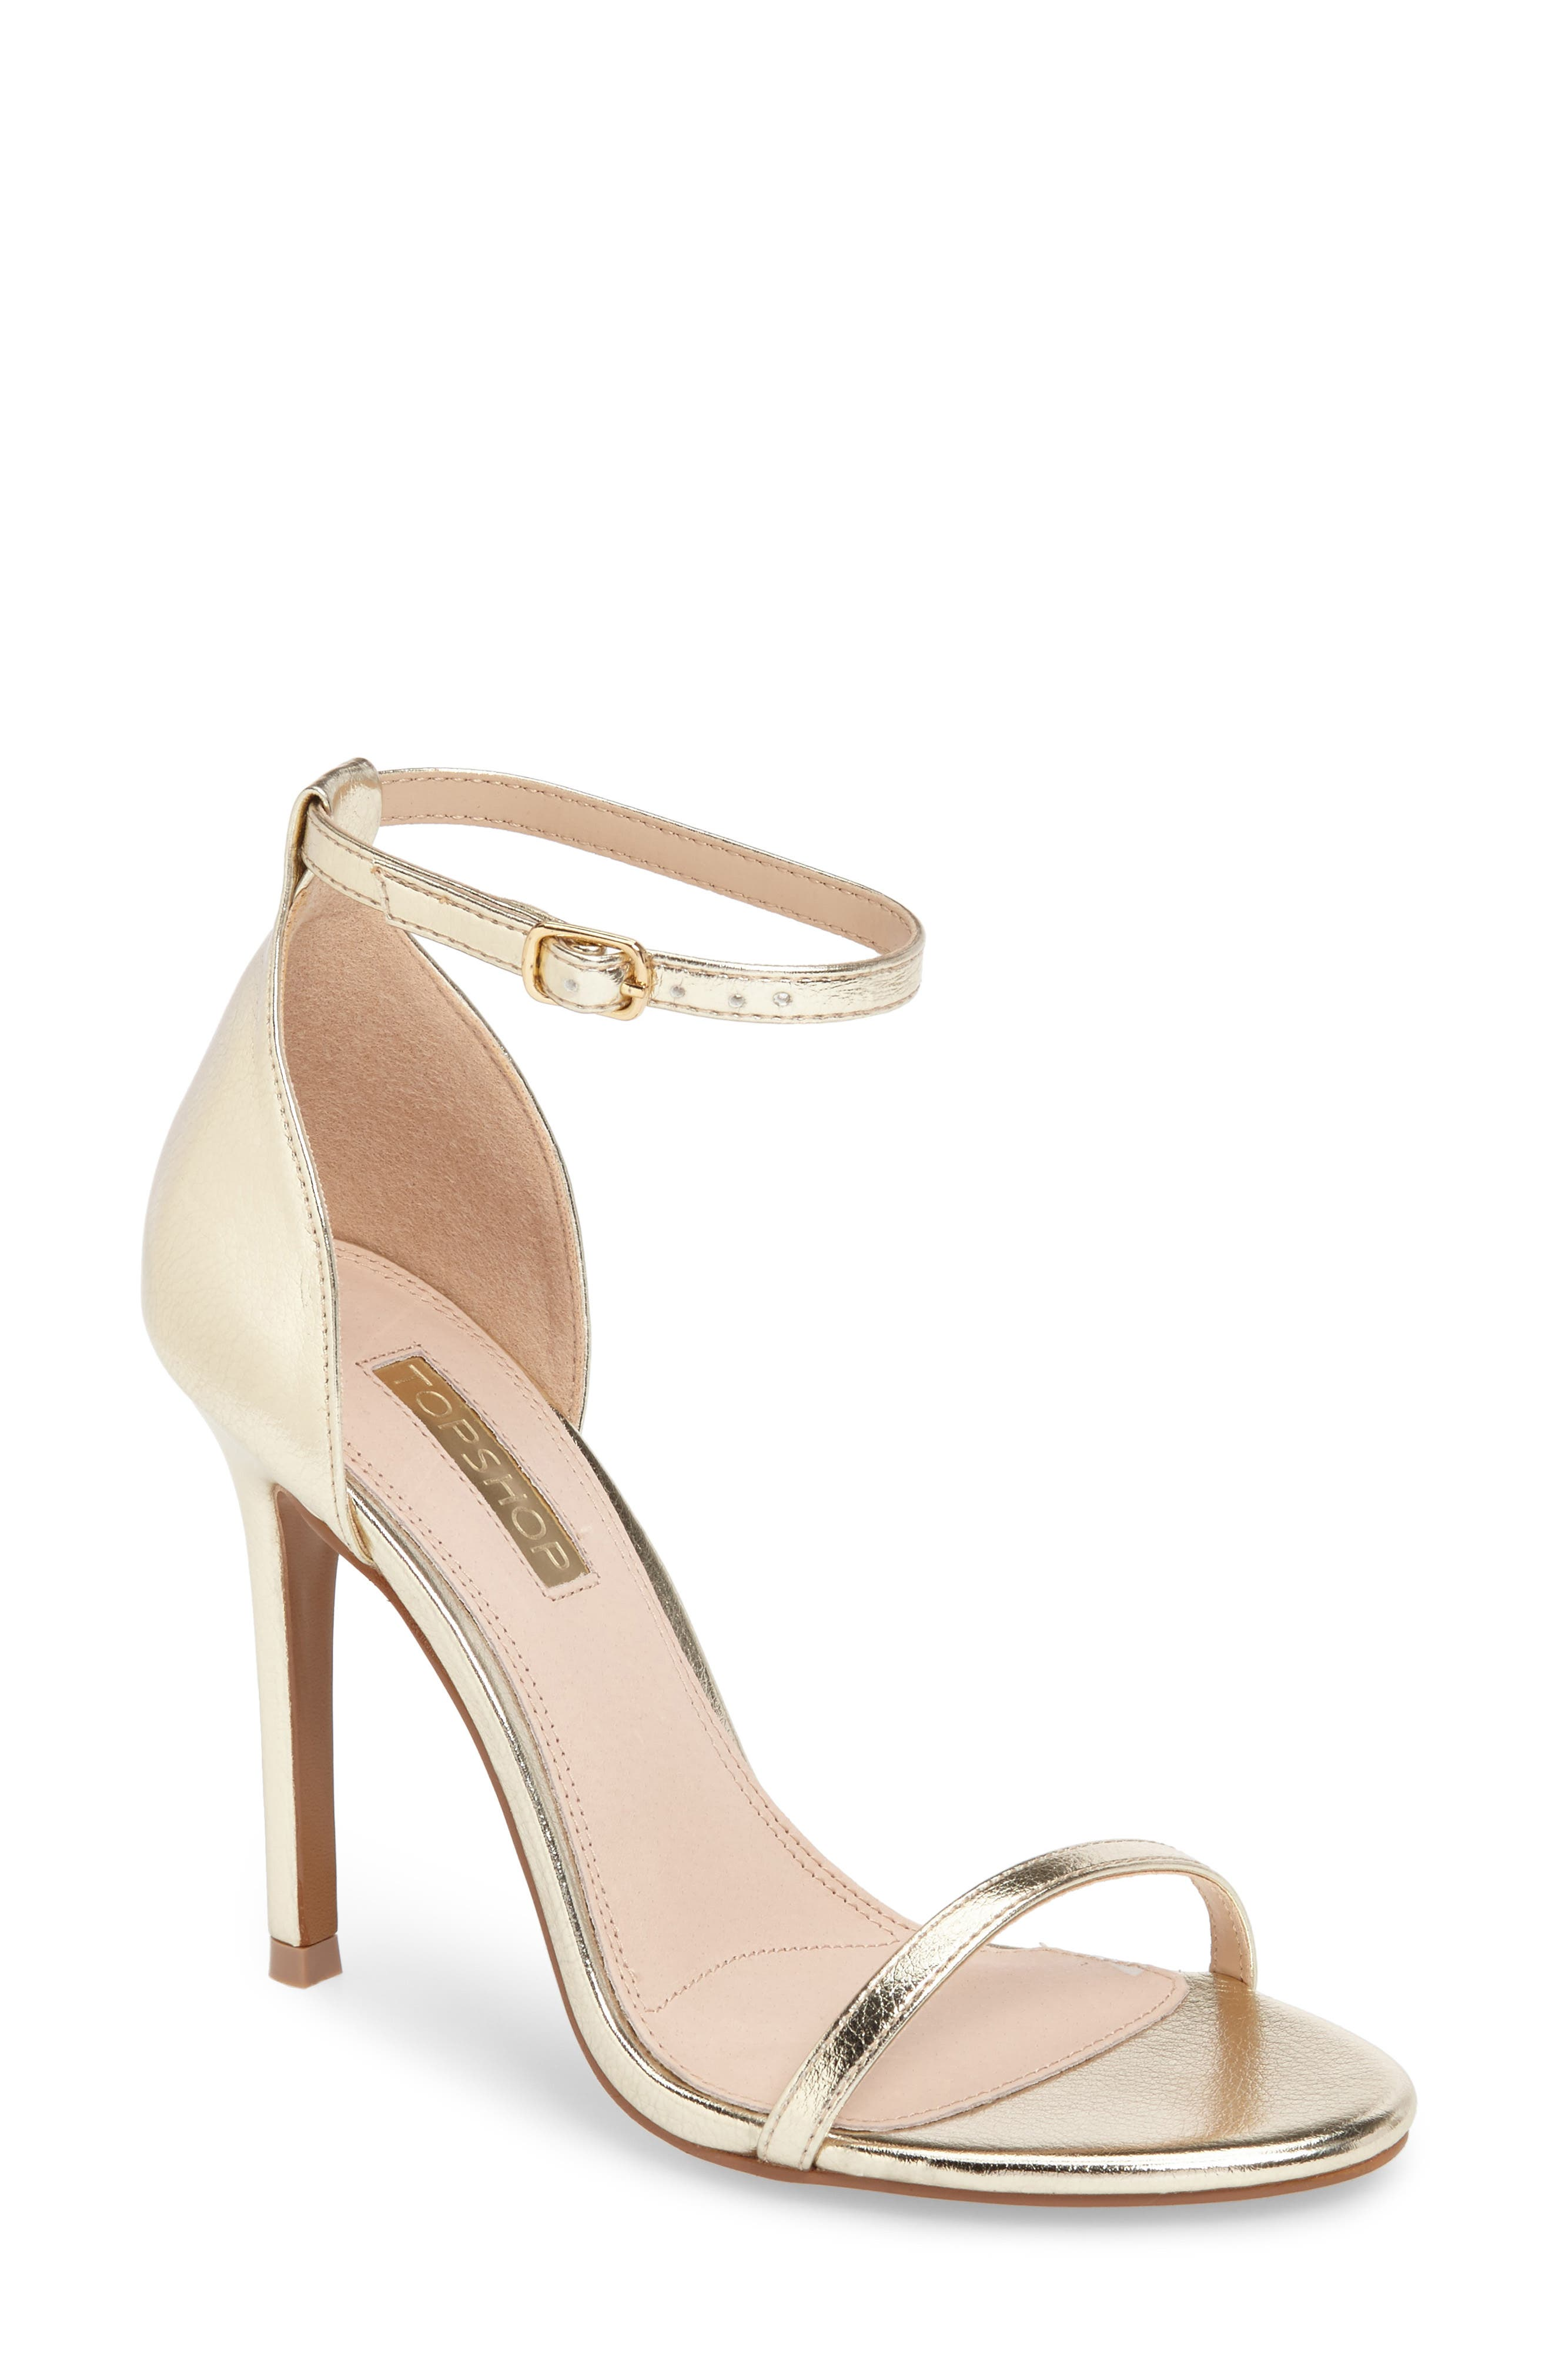 Main Image - Topshop Rosalie Ankle Strap Sandal (Women)